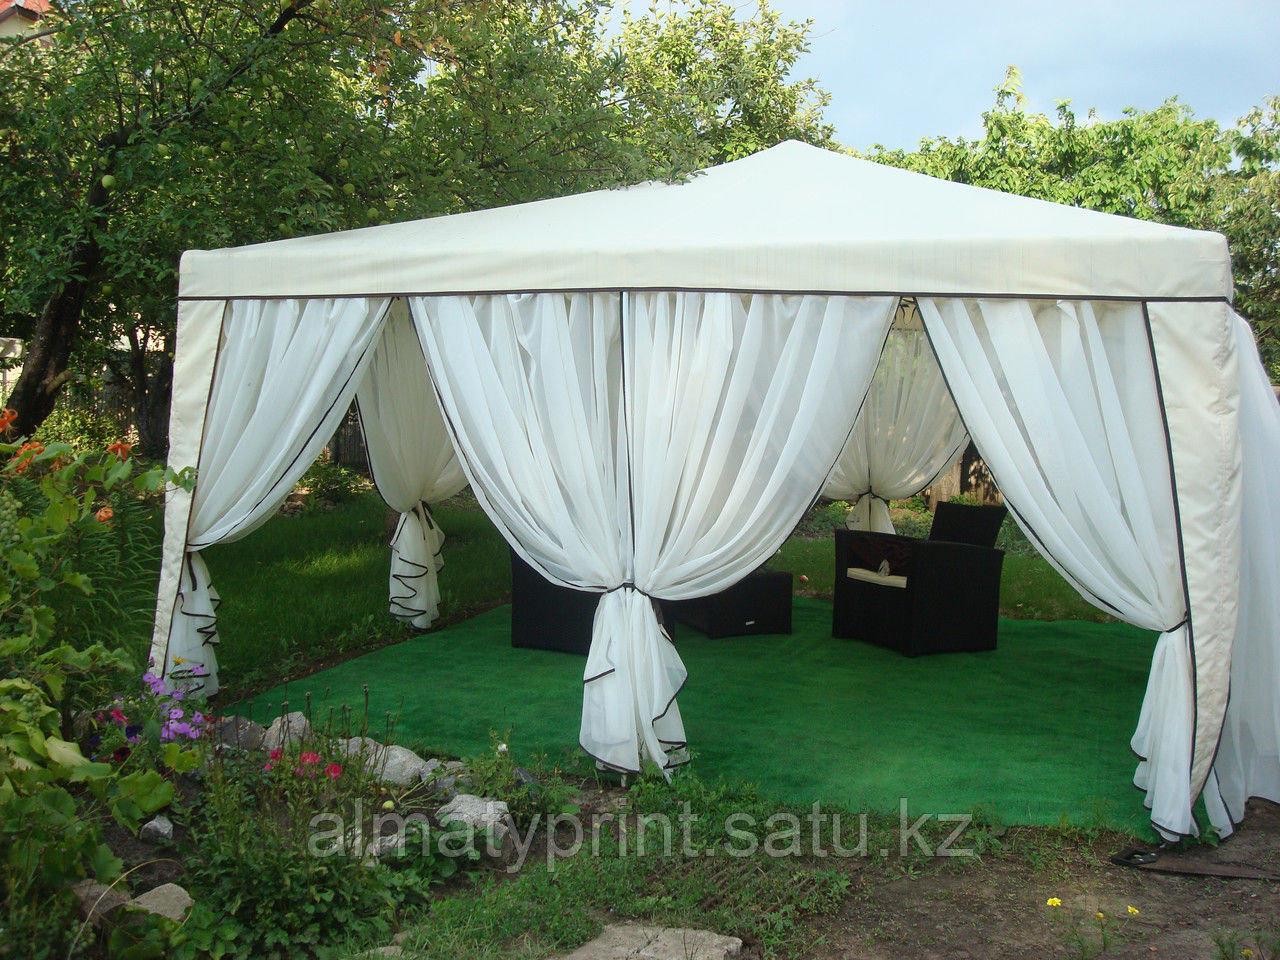 Изготовление палаток - фото 3